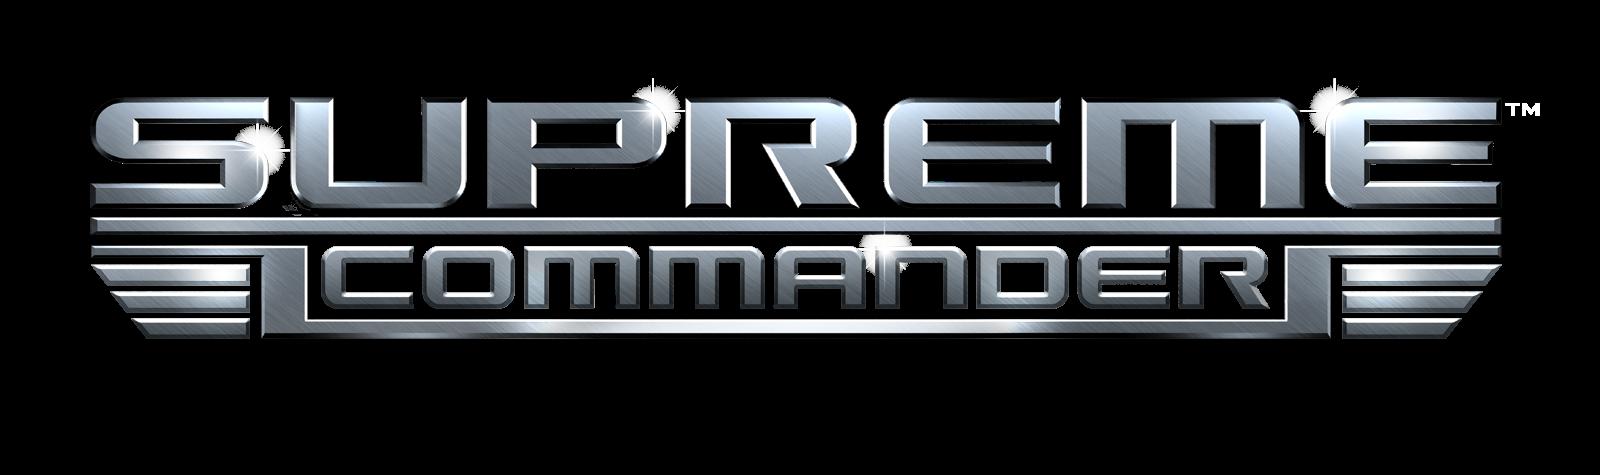 Image result for supcom logo png